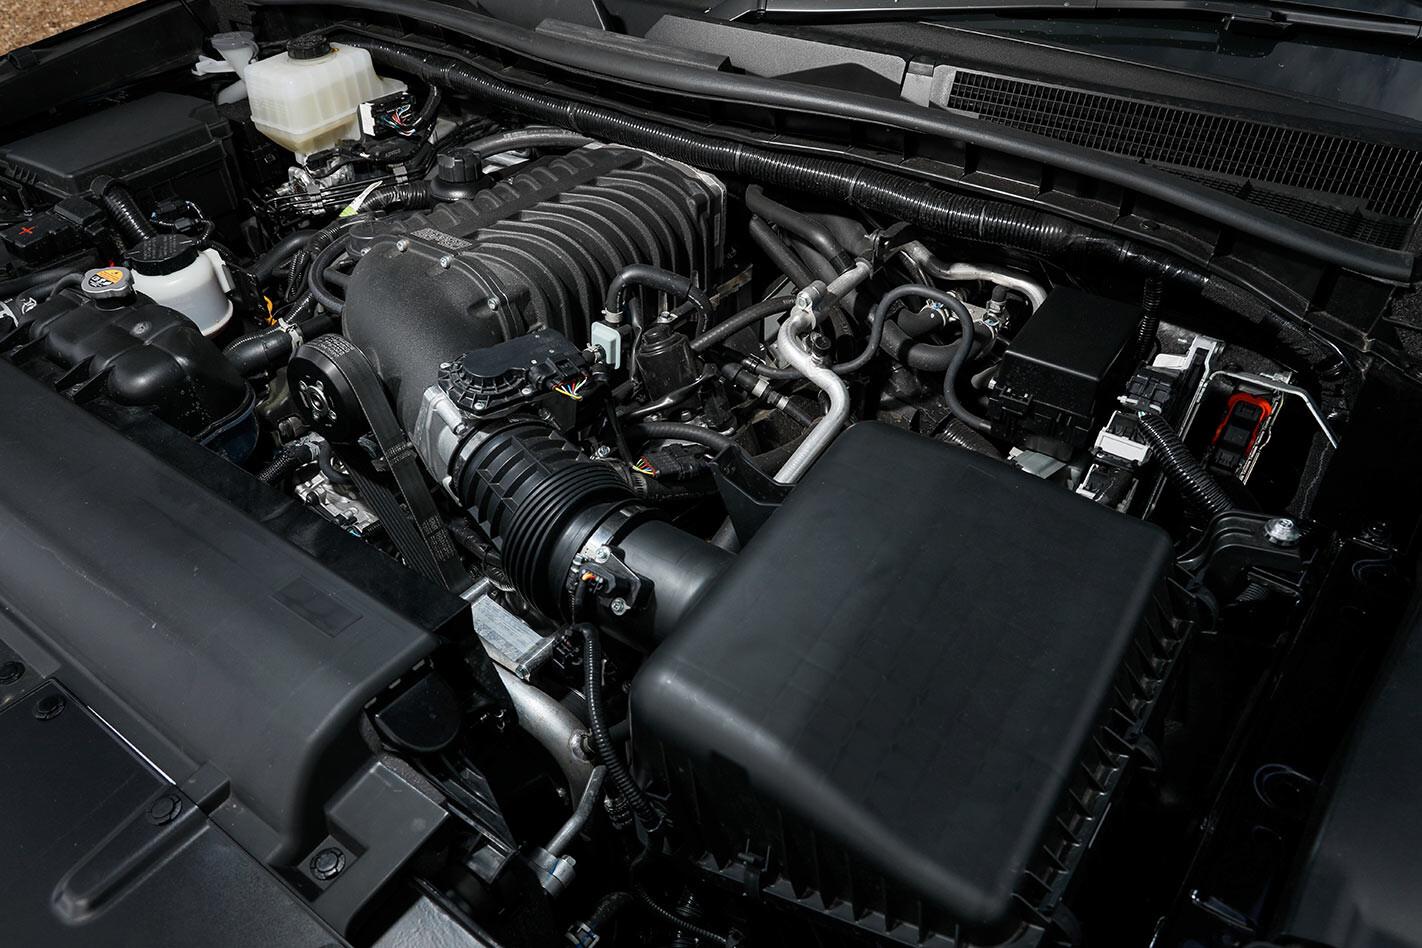 Harrop Supercharged 2020 Nissan Patrol engine bay